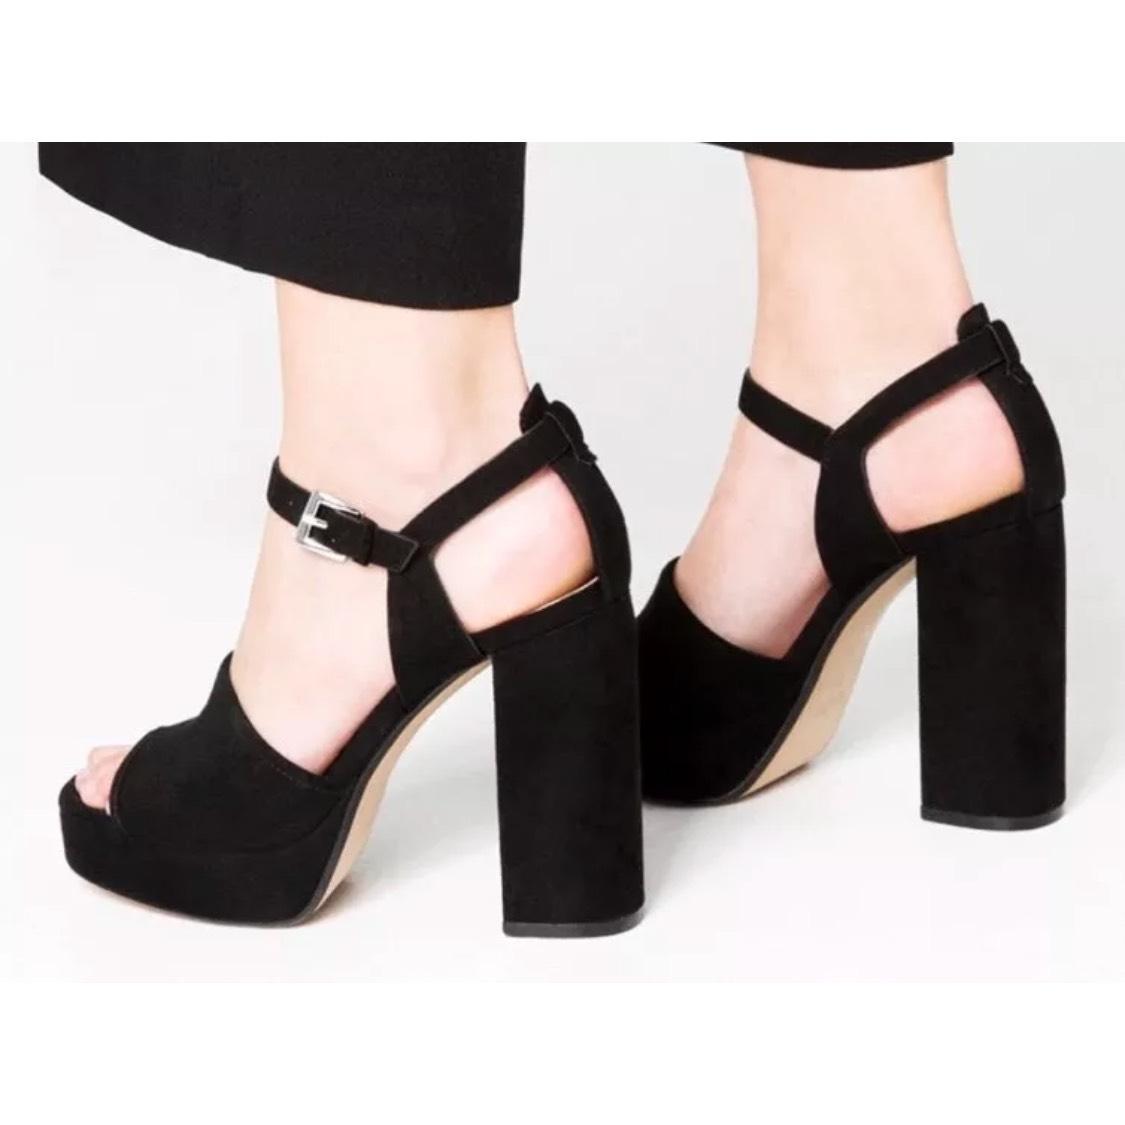 9ad7abc00f43 Zara Black Platform Sandals - Best Designer Shoes Review For You